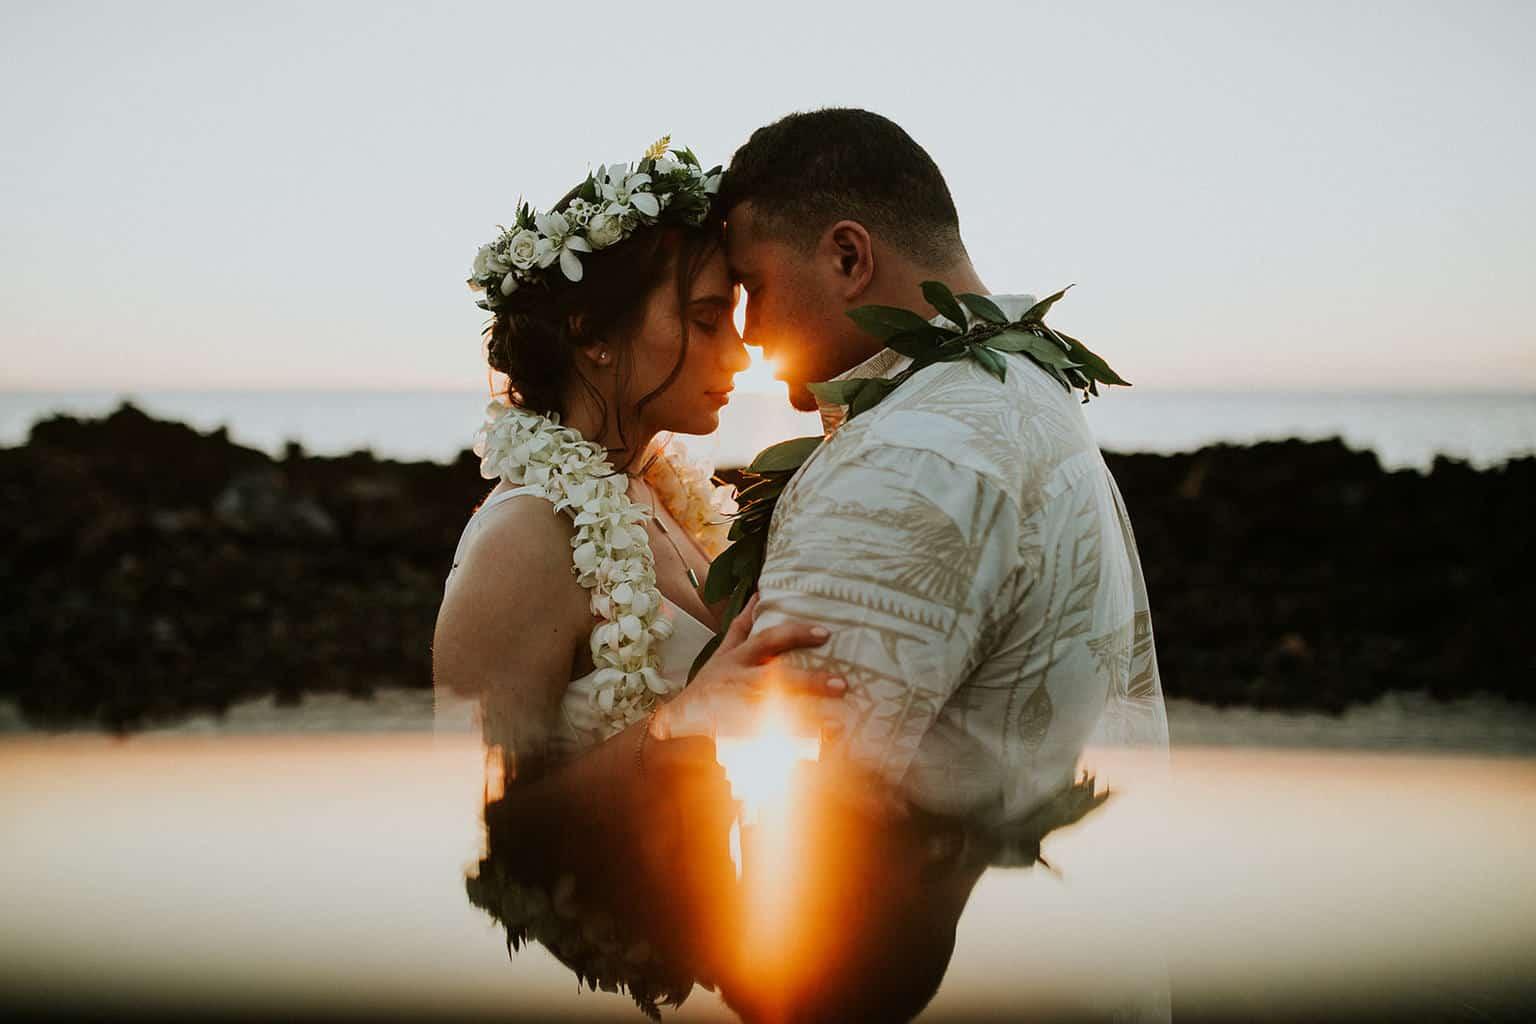 hilton waikoloa village elopement, hilton waikoloa wedding, big island elopement, hawaii elopement, big island elopement photos, big island elopement photographer